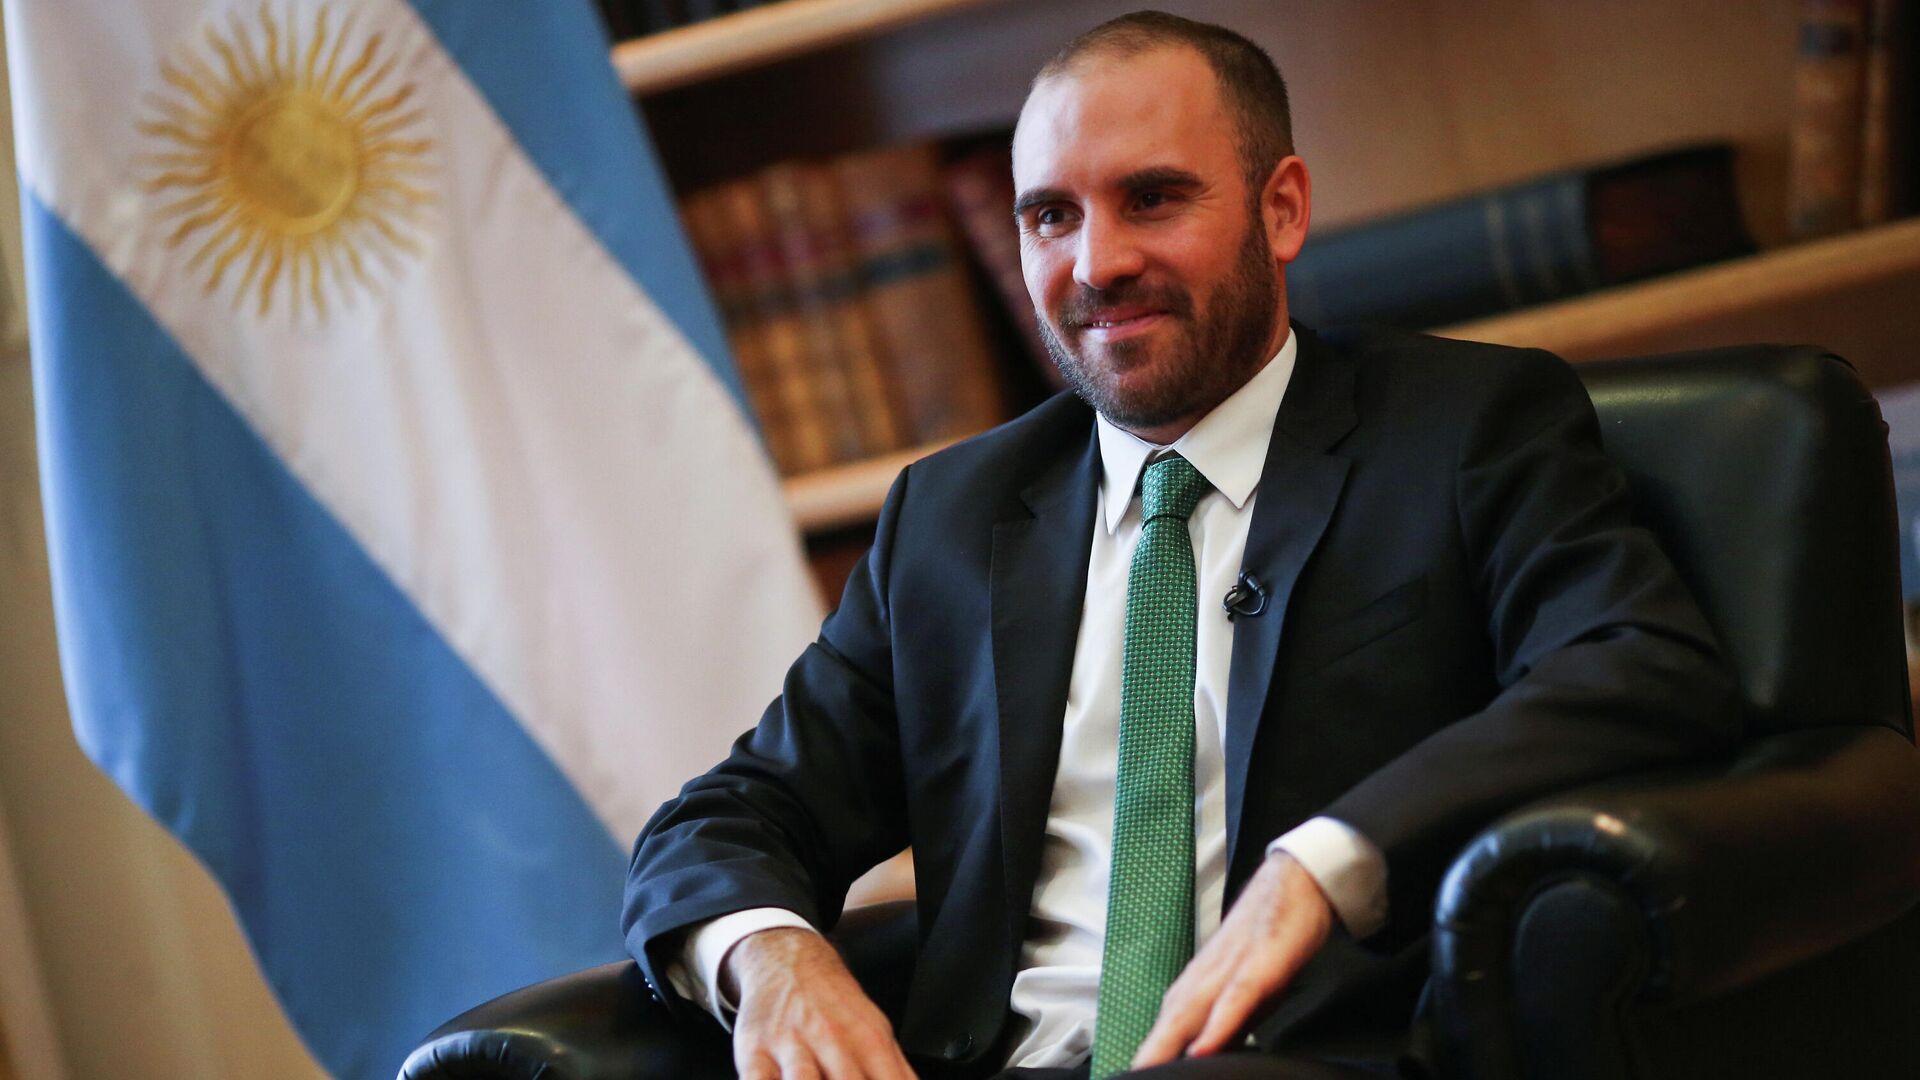 Martín Guzmán, ministro de Economía argentino - Sputnik Mundo, 1920, 21.04.2021